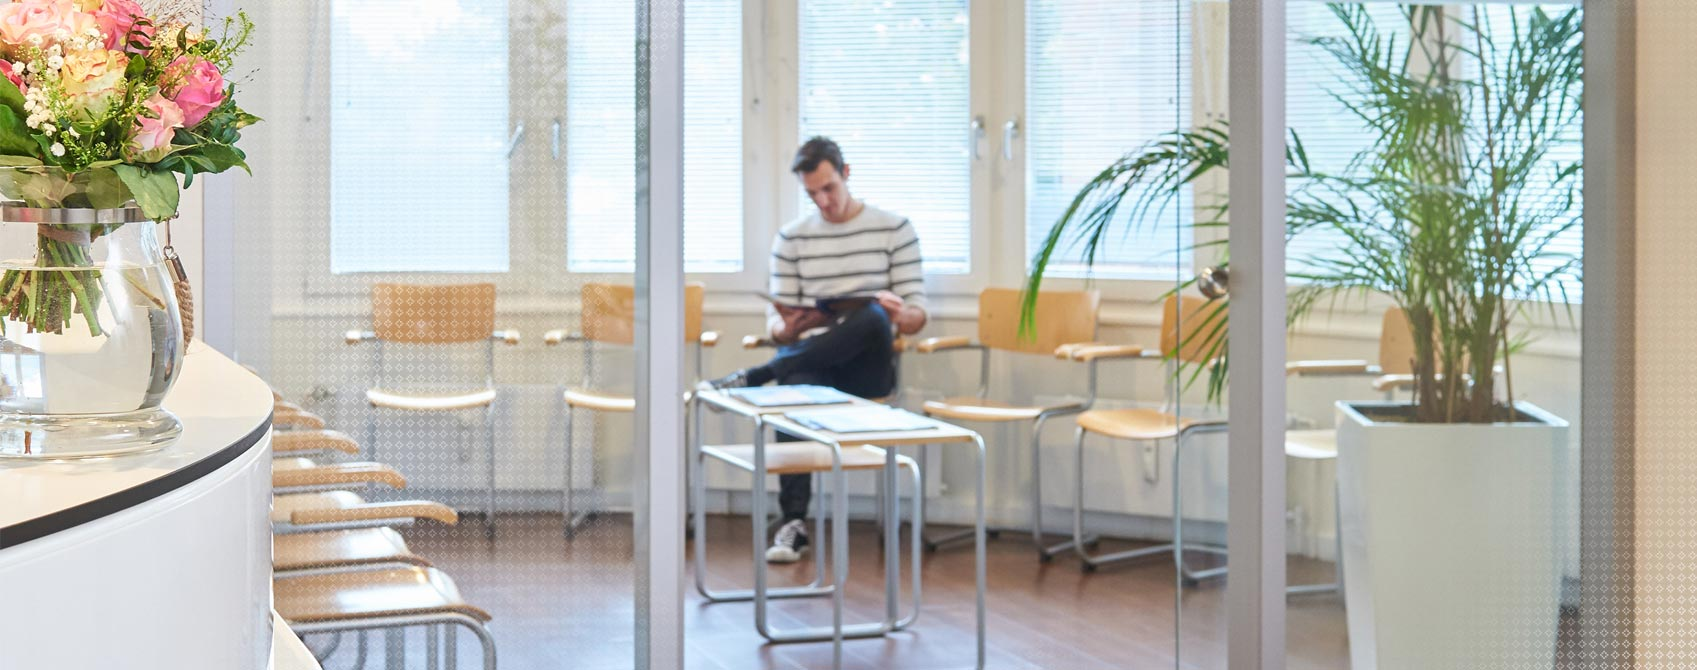 Wartezimmer Hausarztpraxis Forum Winterhude